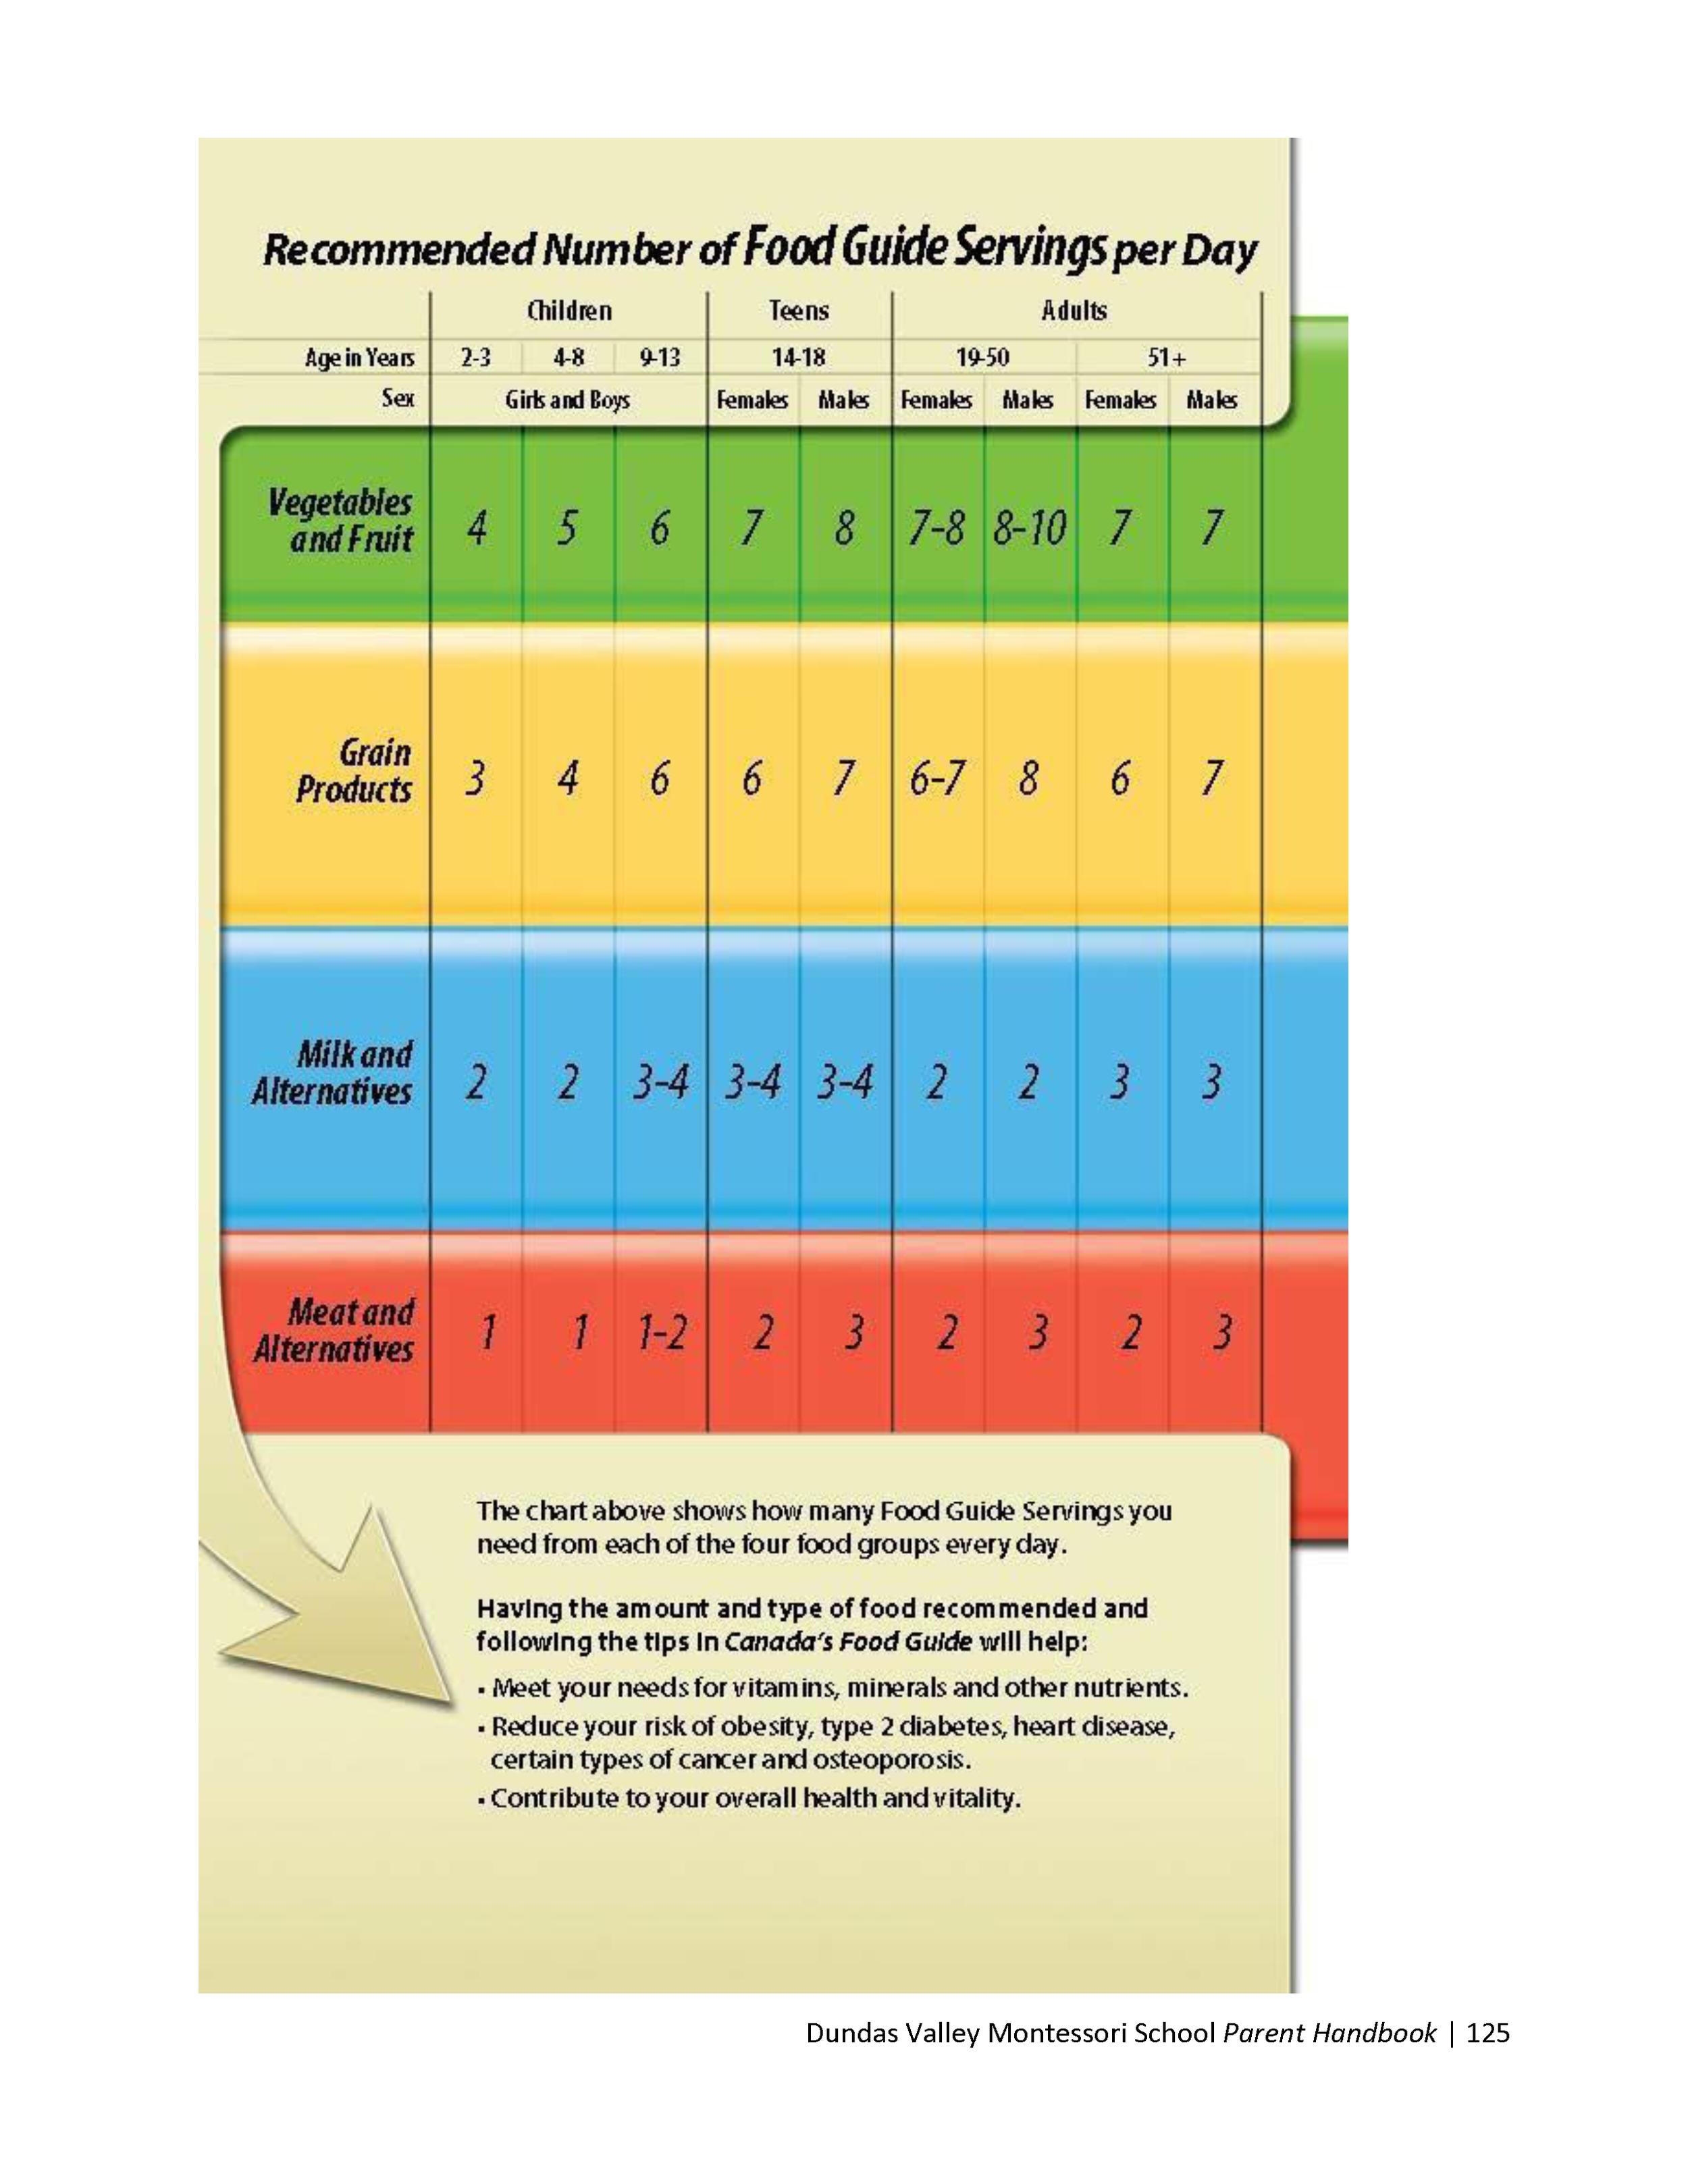 DVMS-Parent-Handbook-19-20_Page_127.png